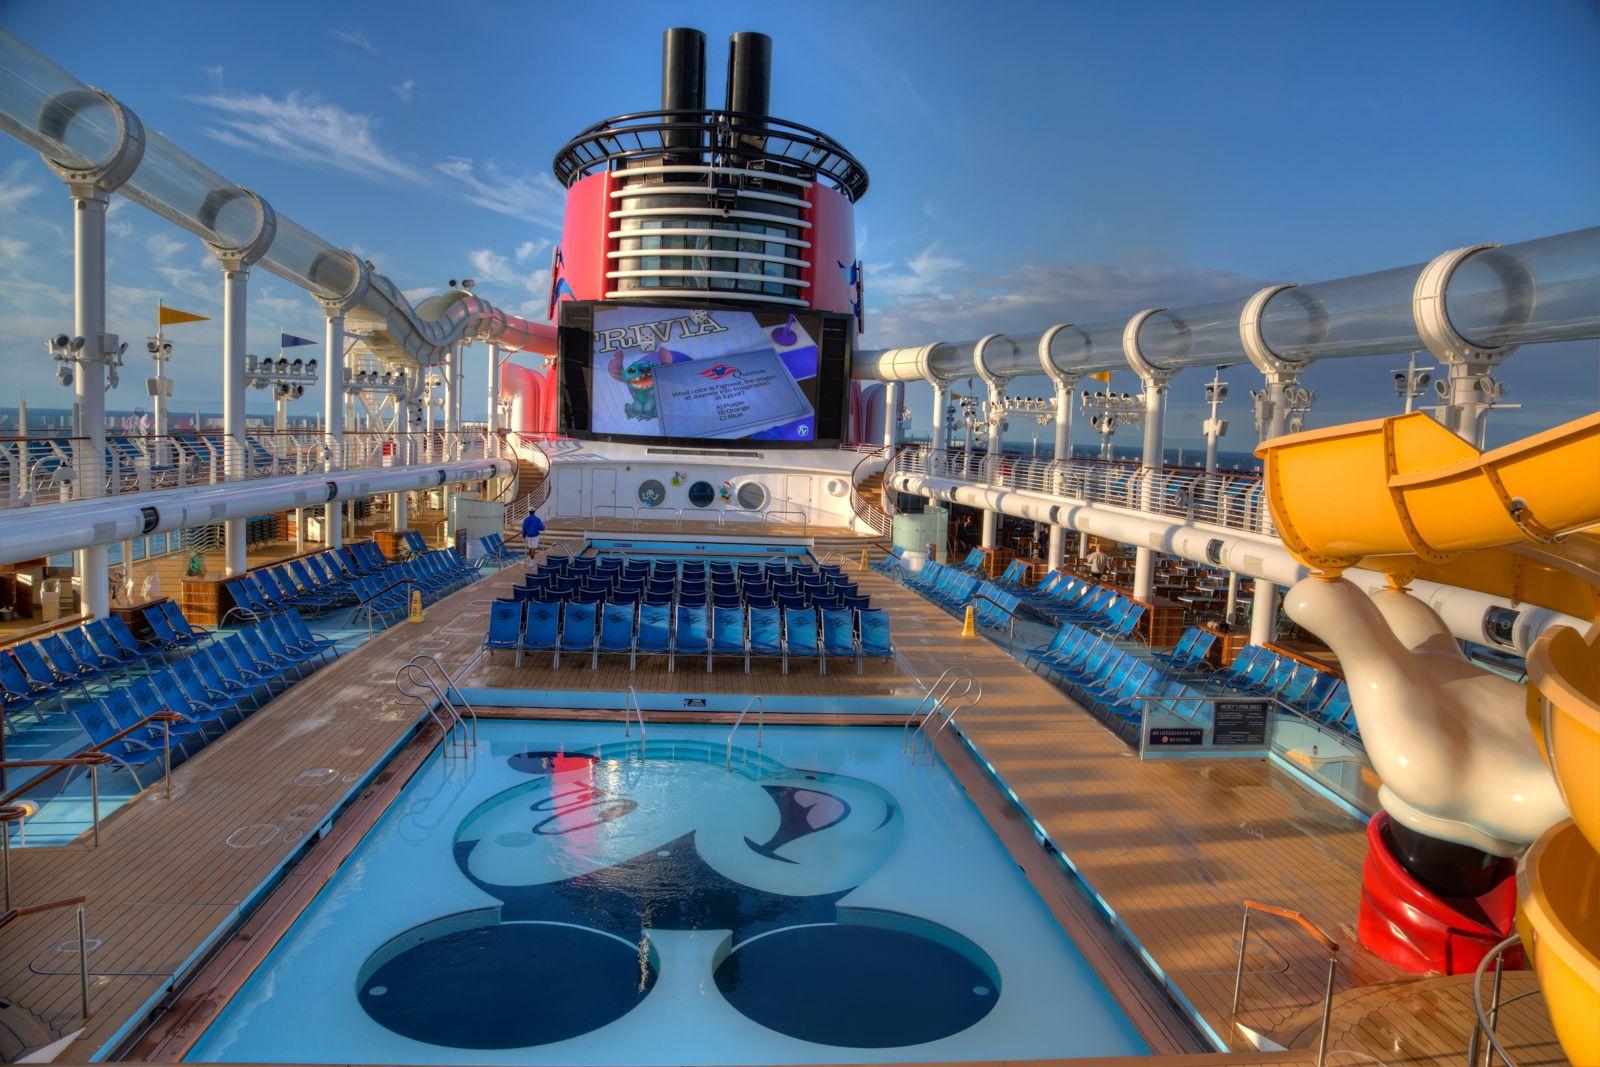 Disney Dream Pool Boatcruise